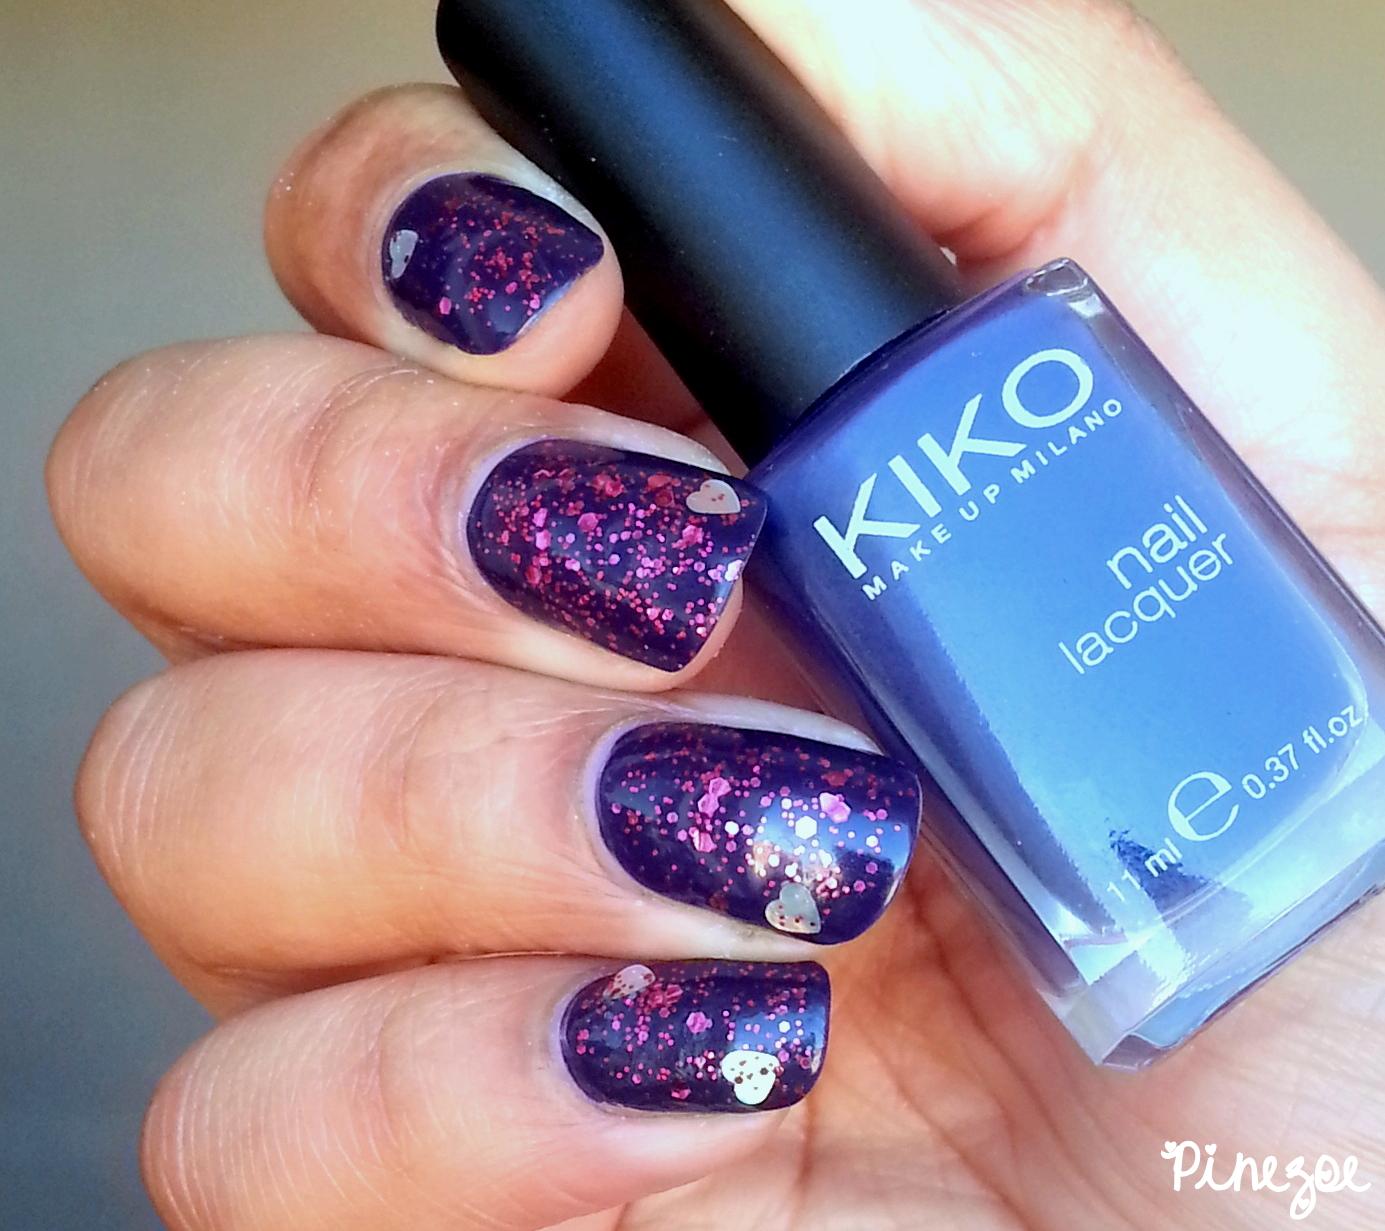 Kiko 334 & 661 - Valentine's day